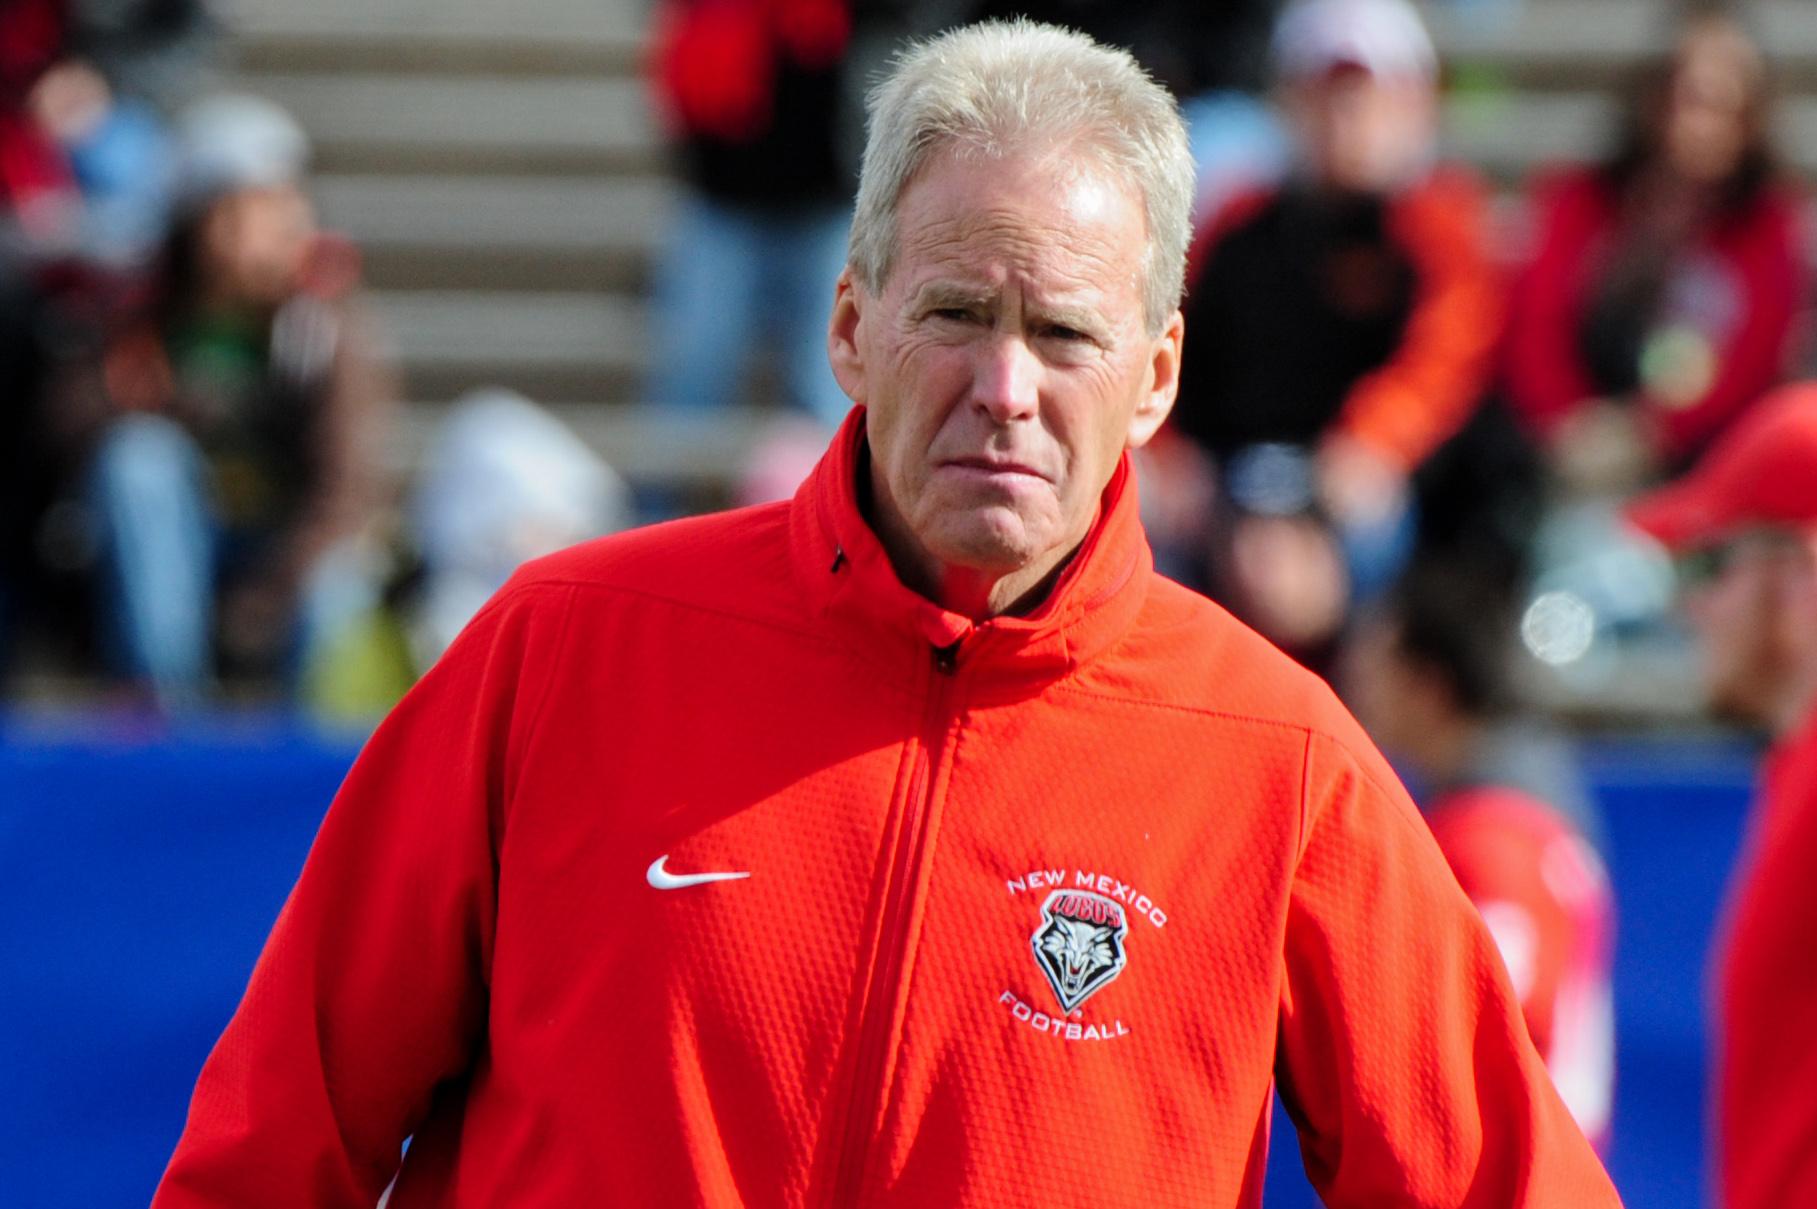 UNM coach Bob Davie readies for another season